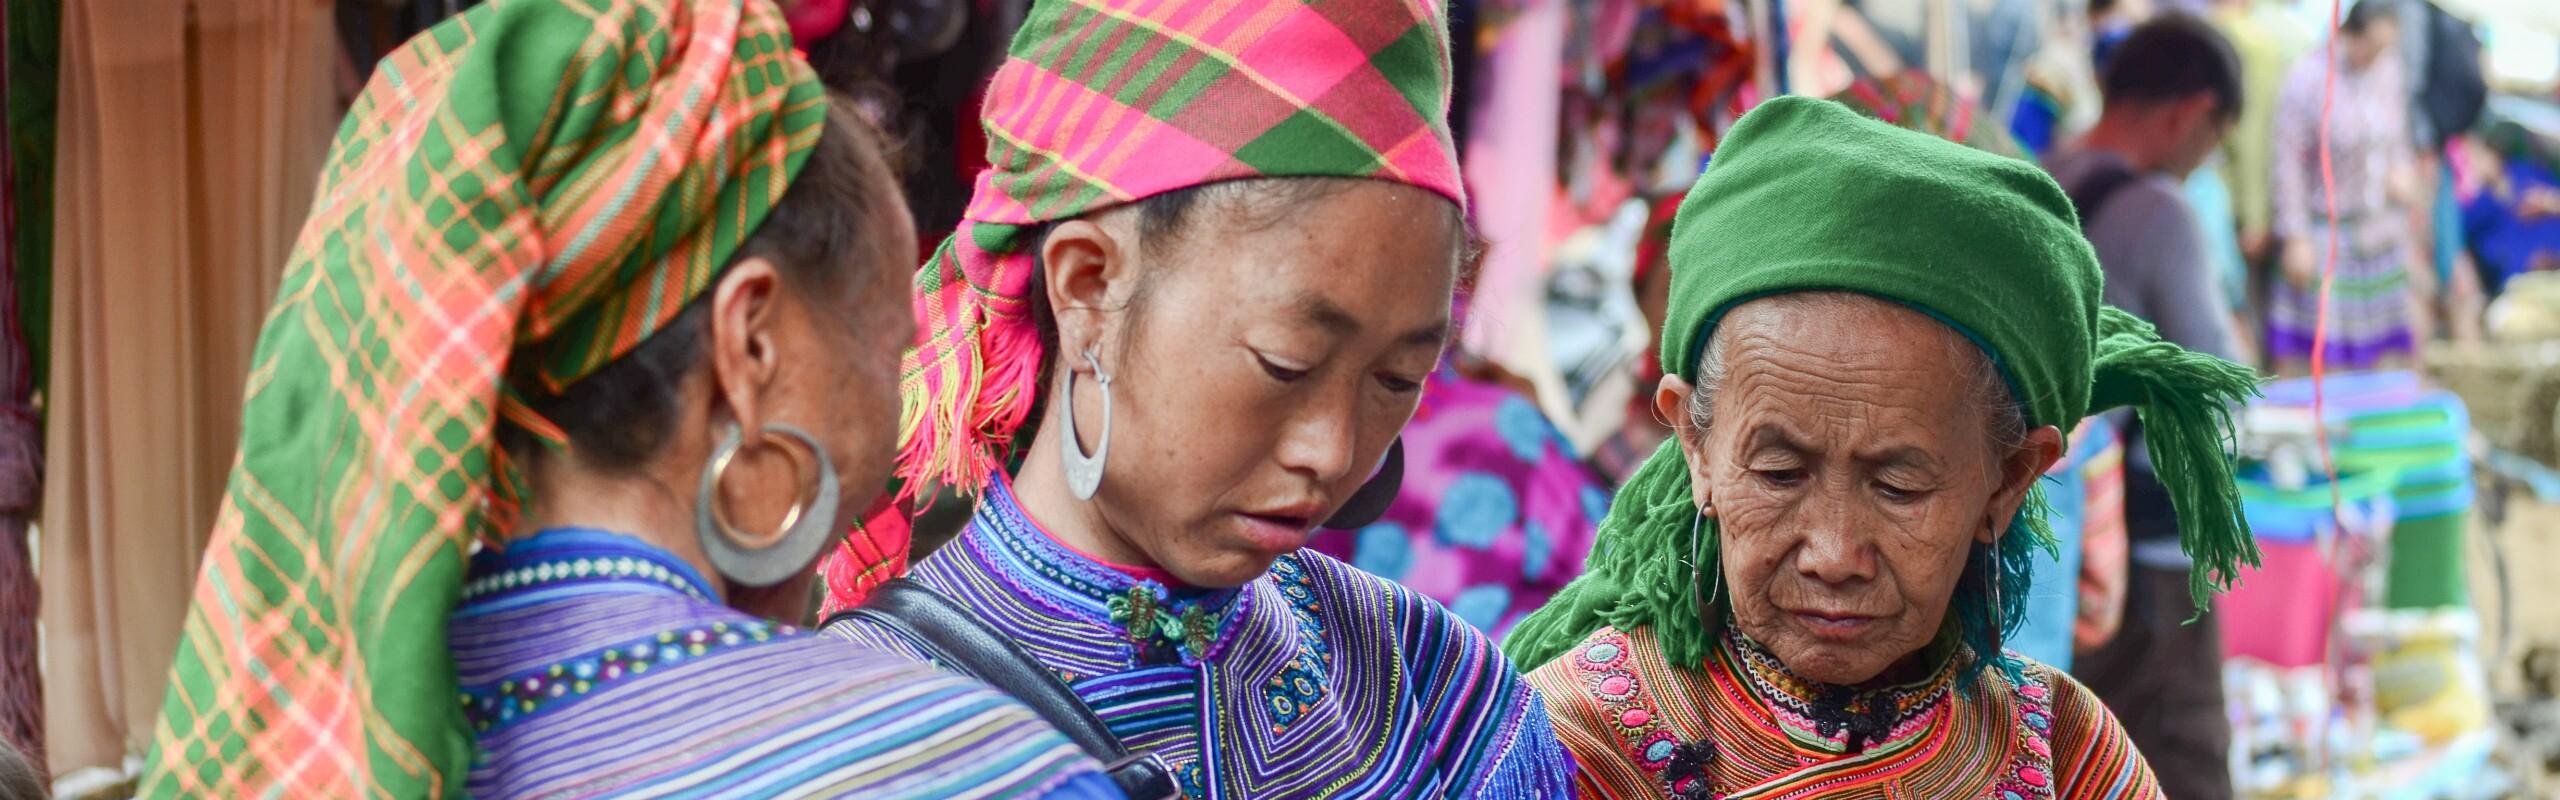 Sapa Ethnic Minority Guide